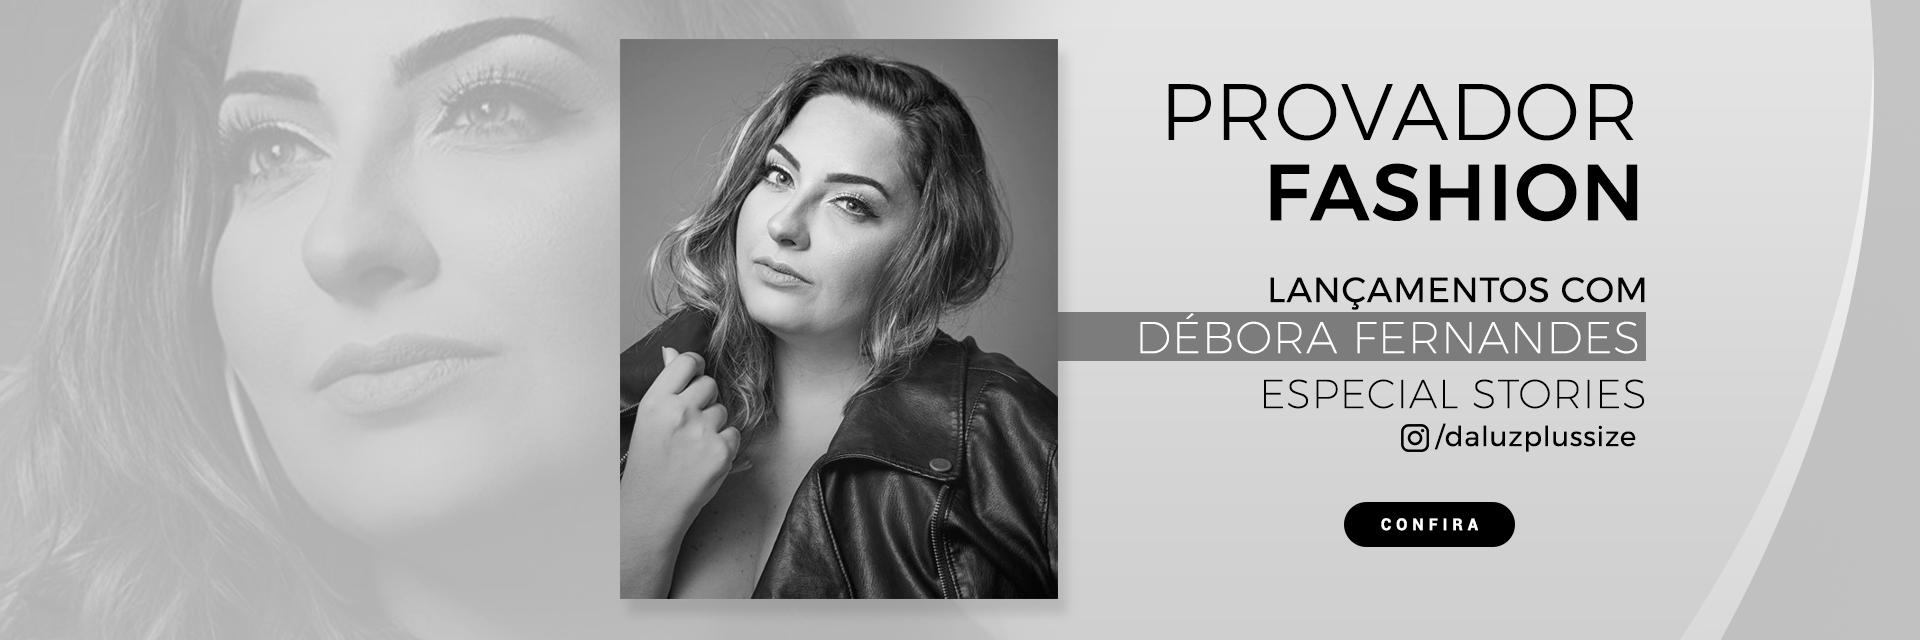 Provador Fashion Débora Fernandes